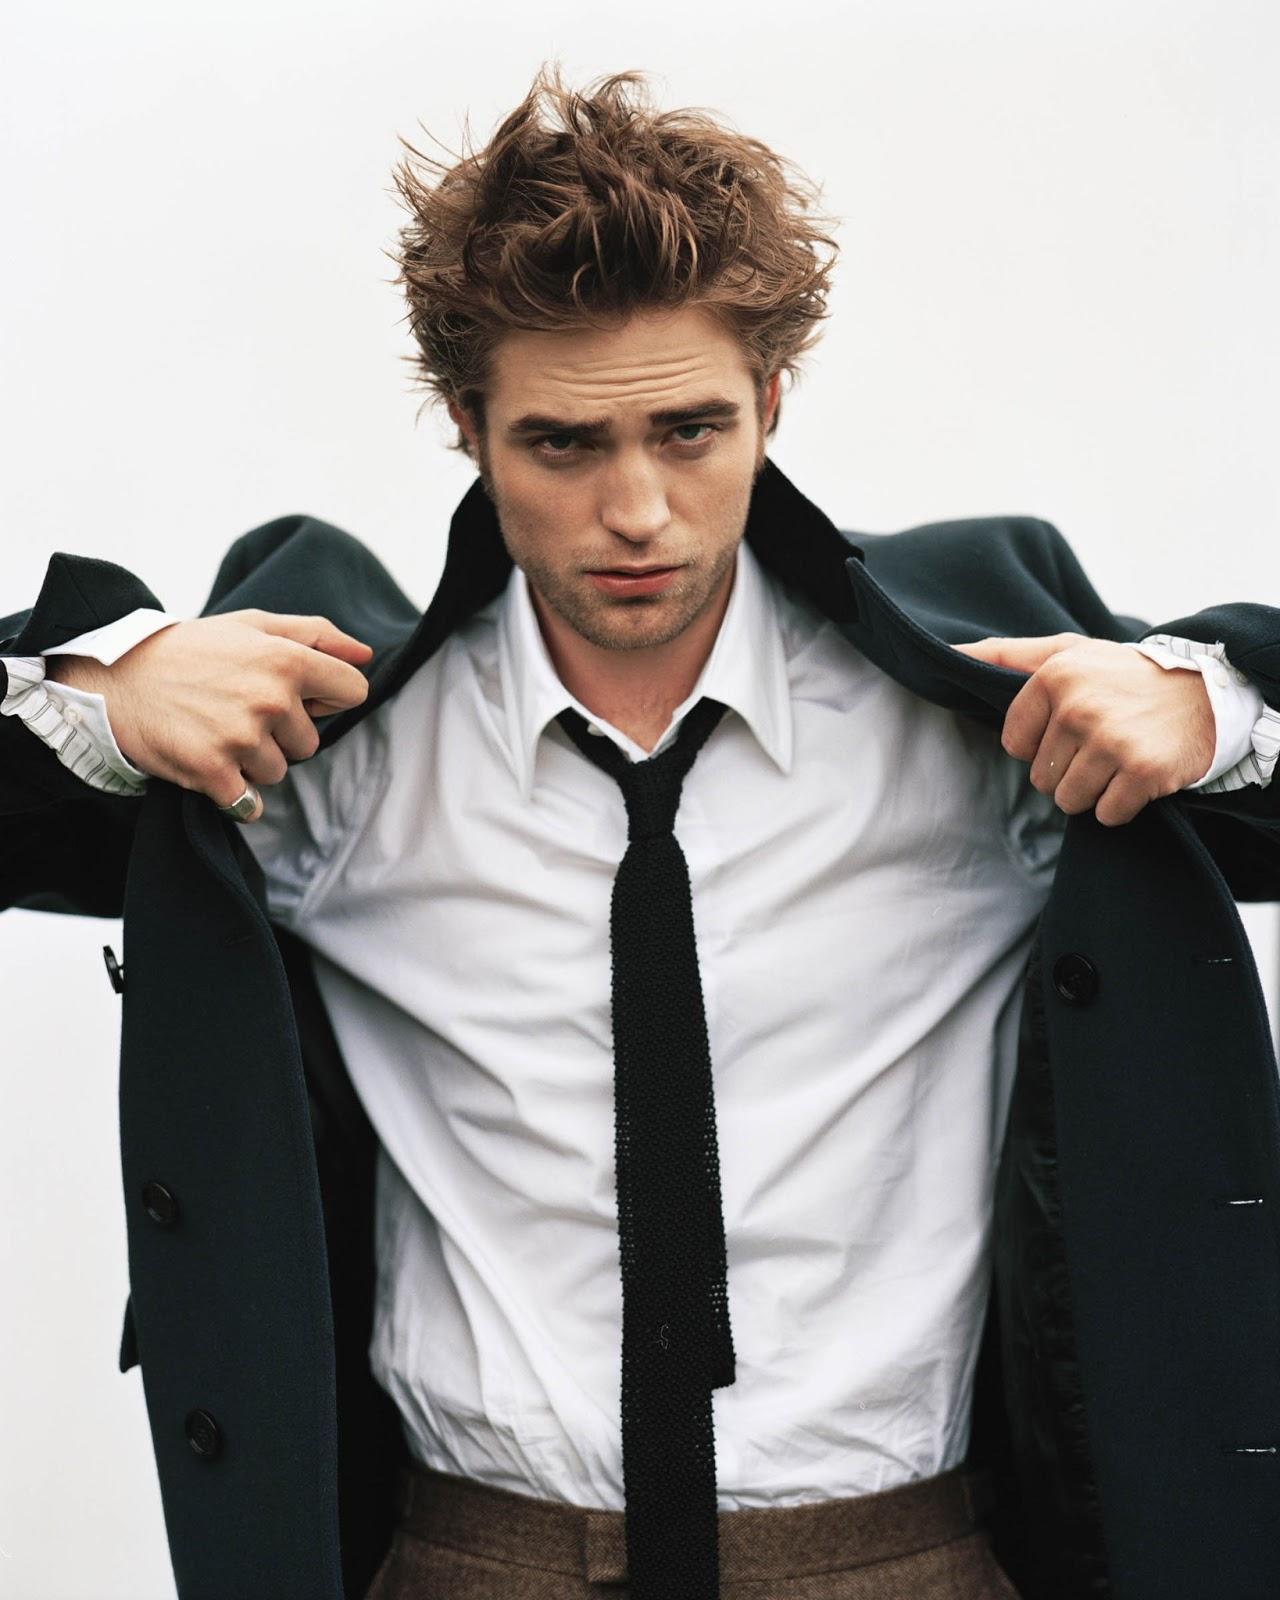 Melhores+fotos+de+Robert+Pattinson.jpg